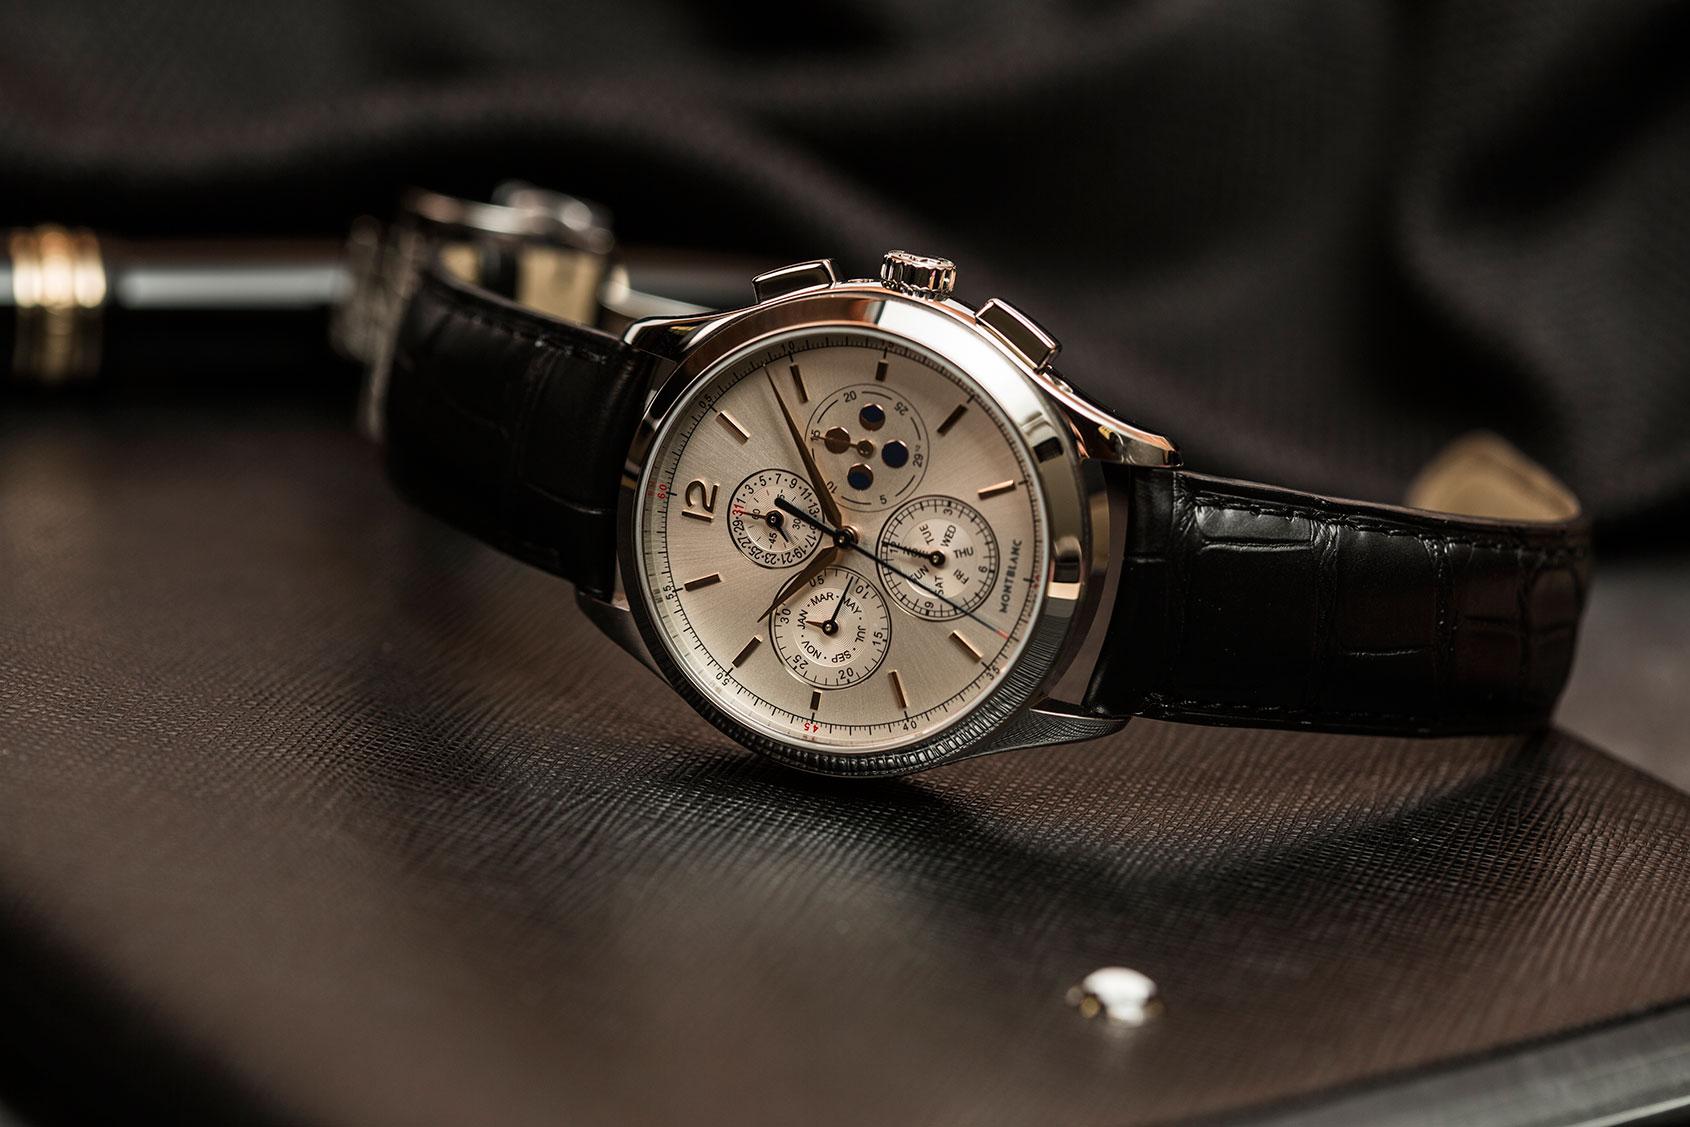 montblanc-heritage-chronometrie-annual-calendar-chronograph-5